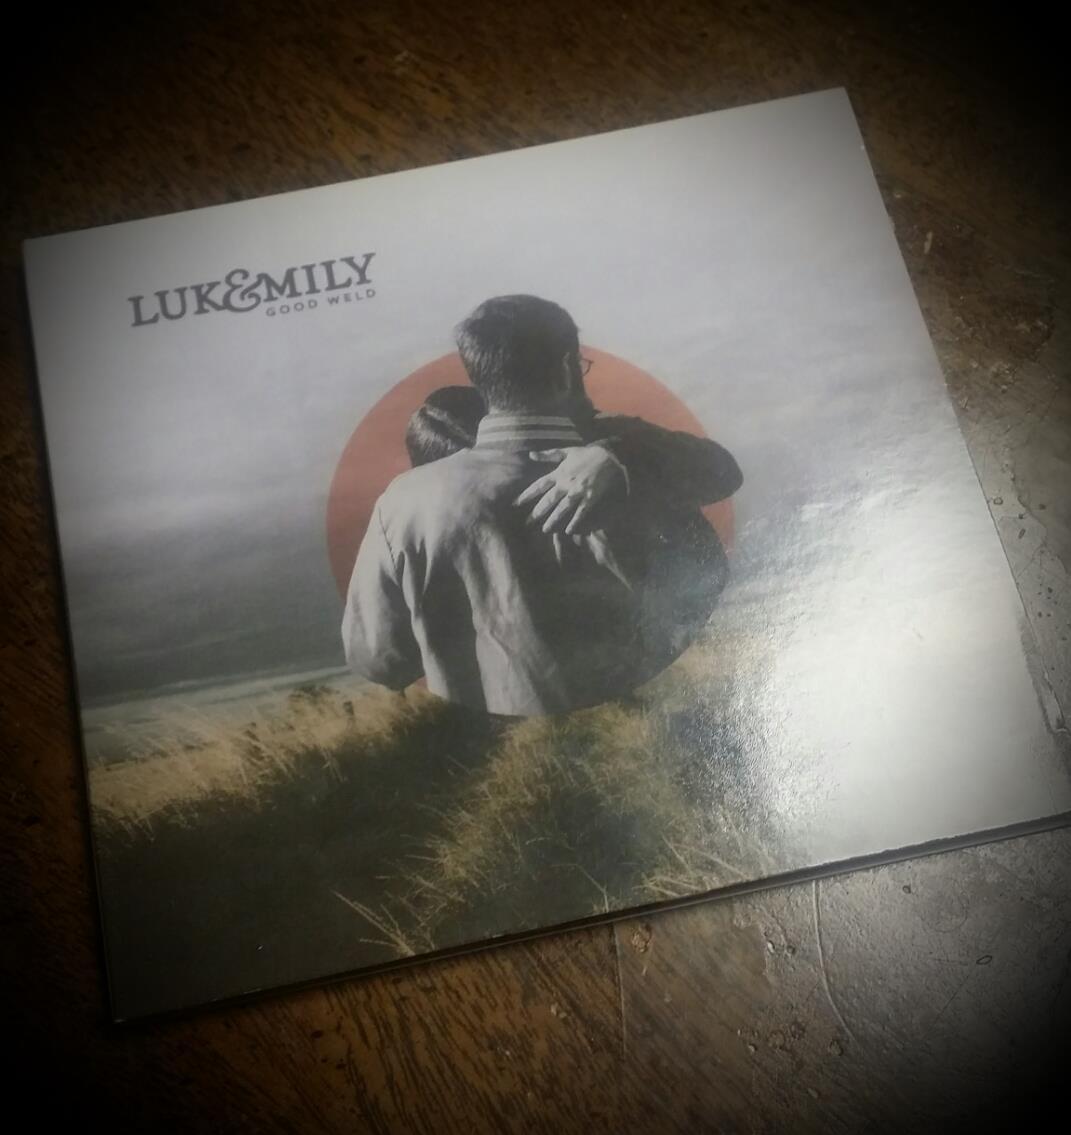 Album Cover photo for Luke & Emily Ash. Design by   Studio Gray  .